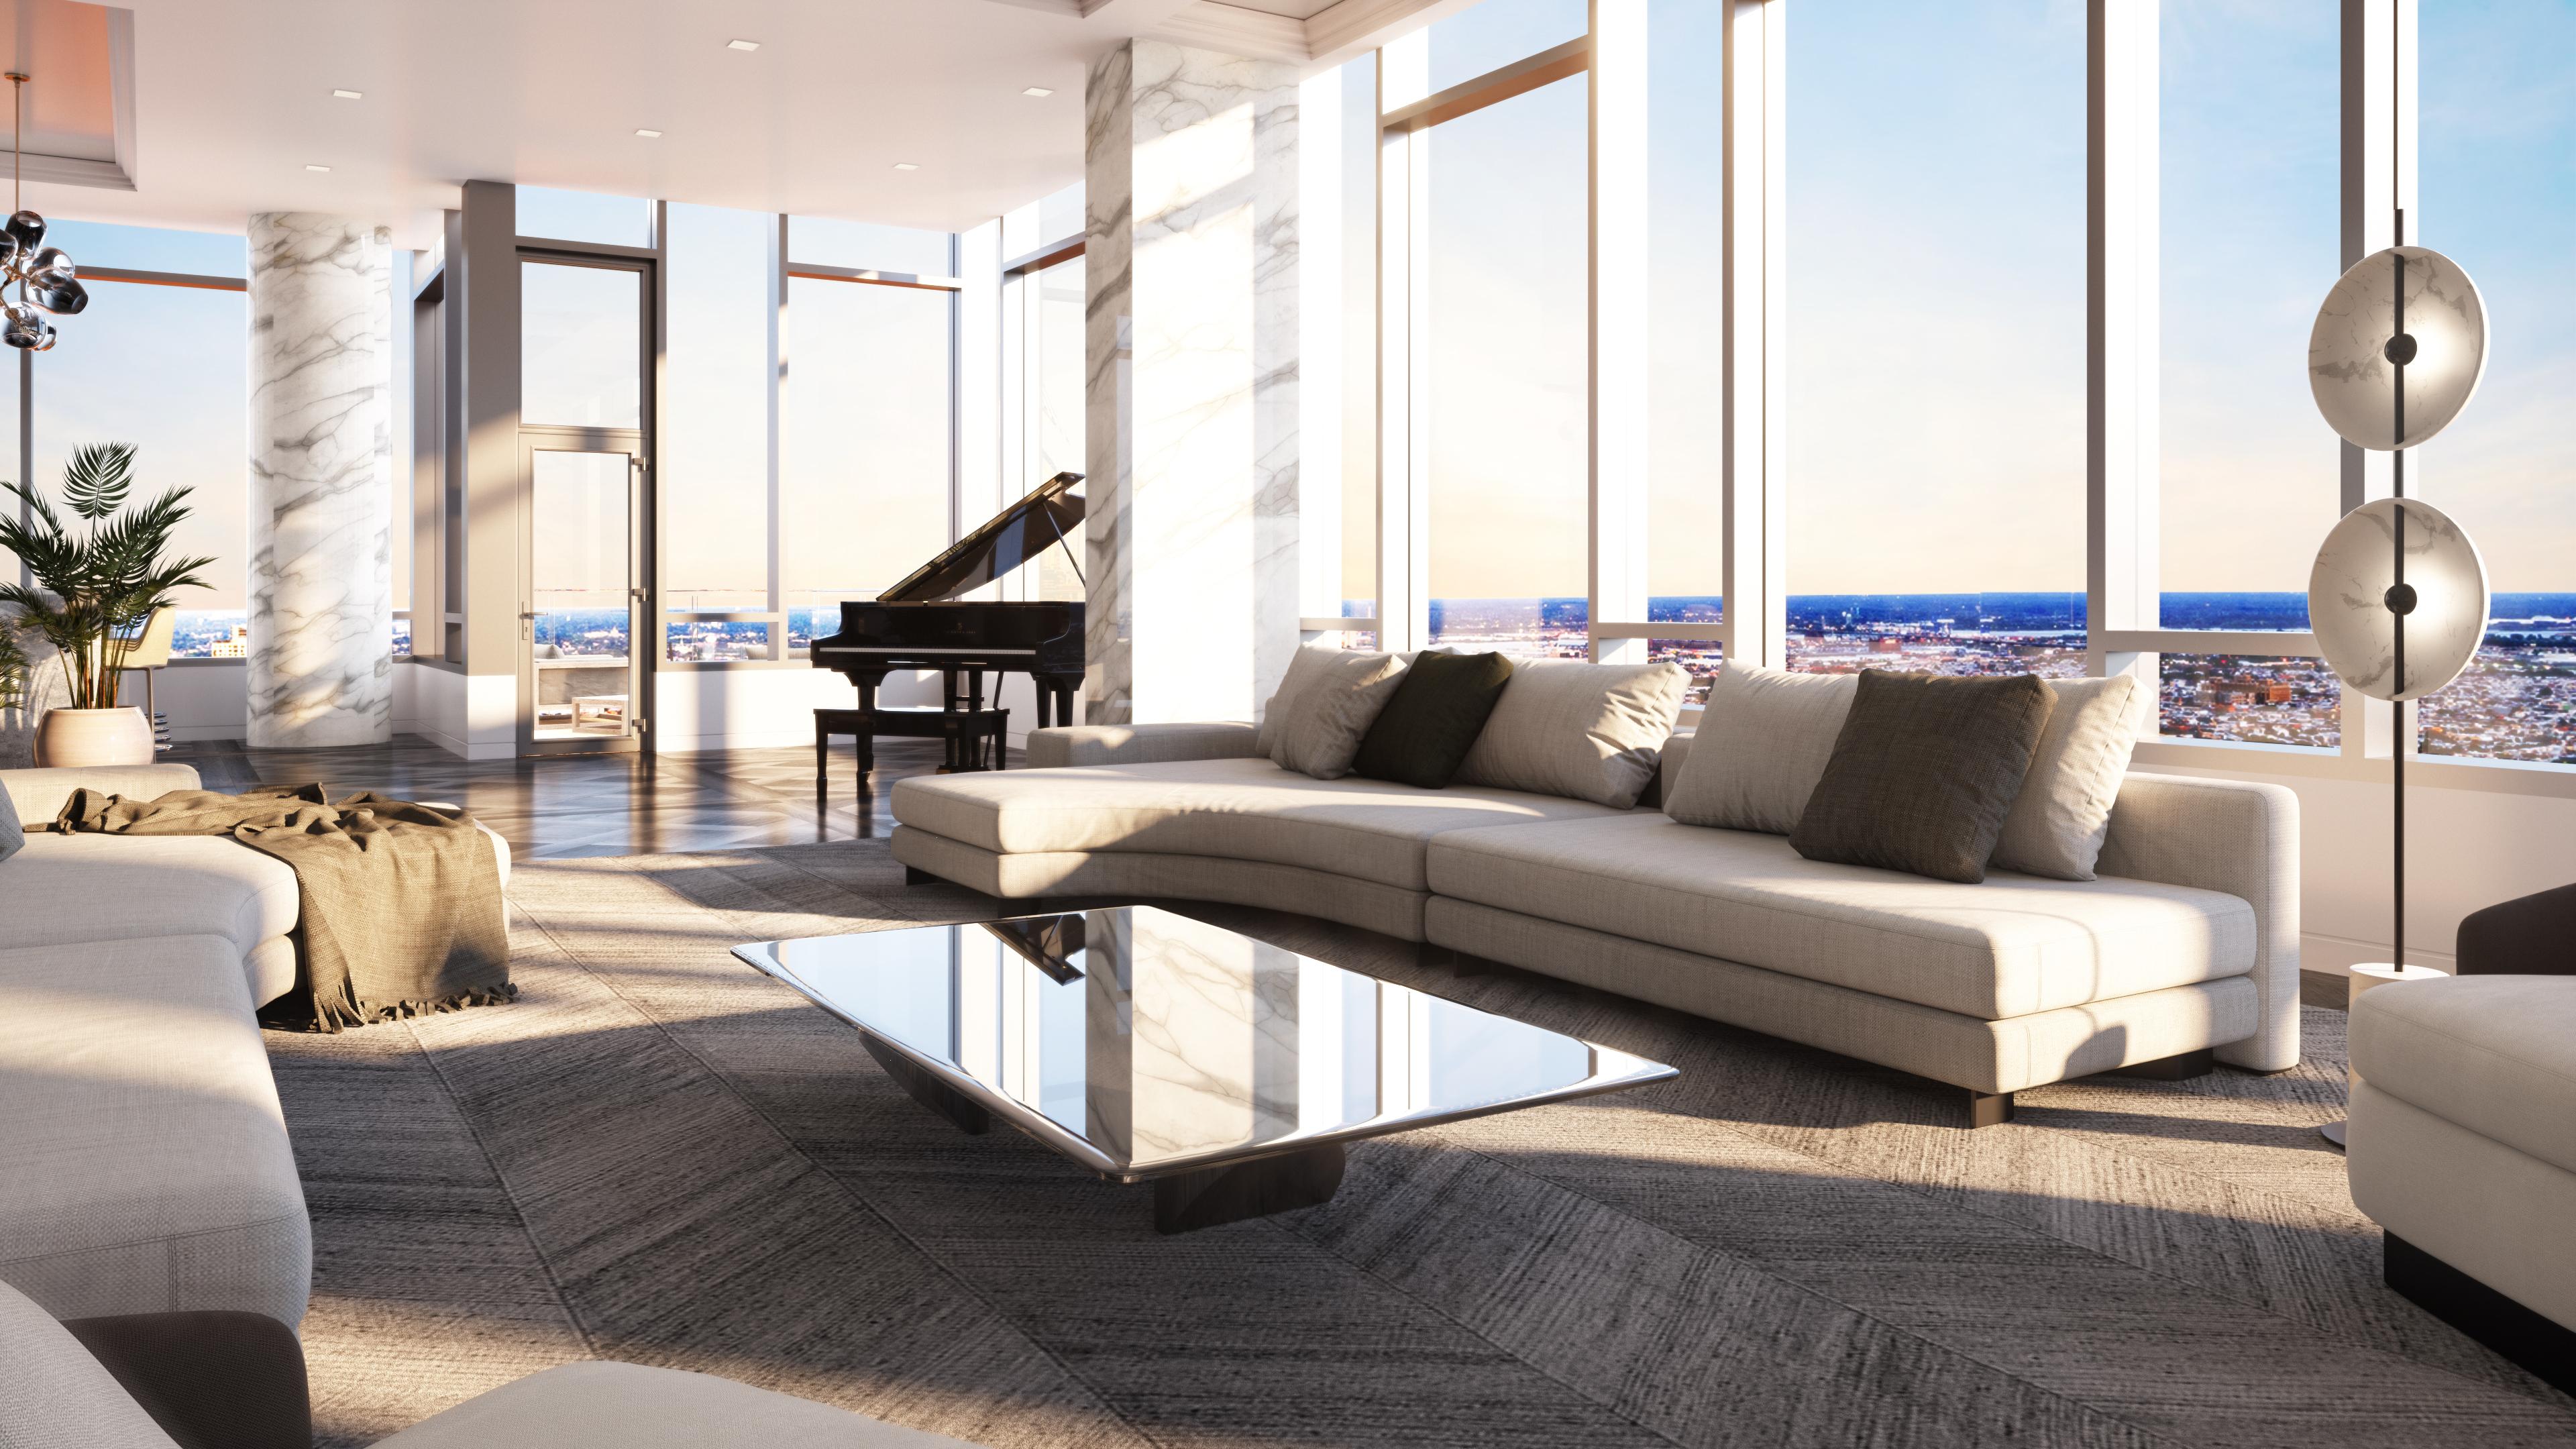 Luxury interior